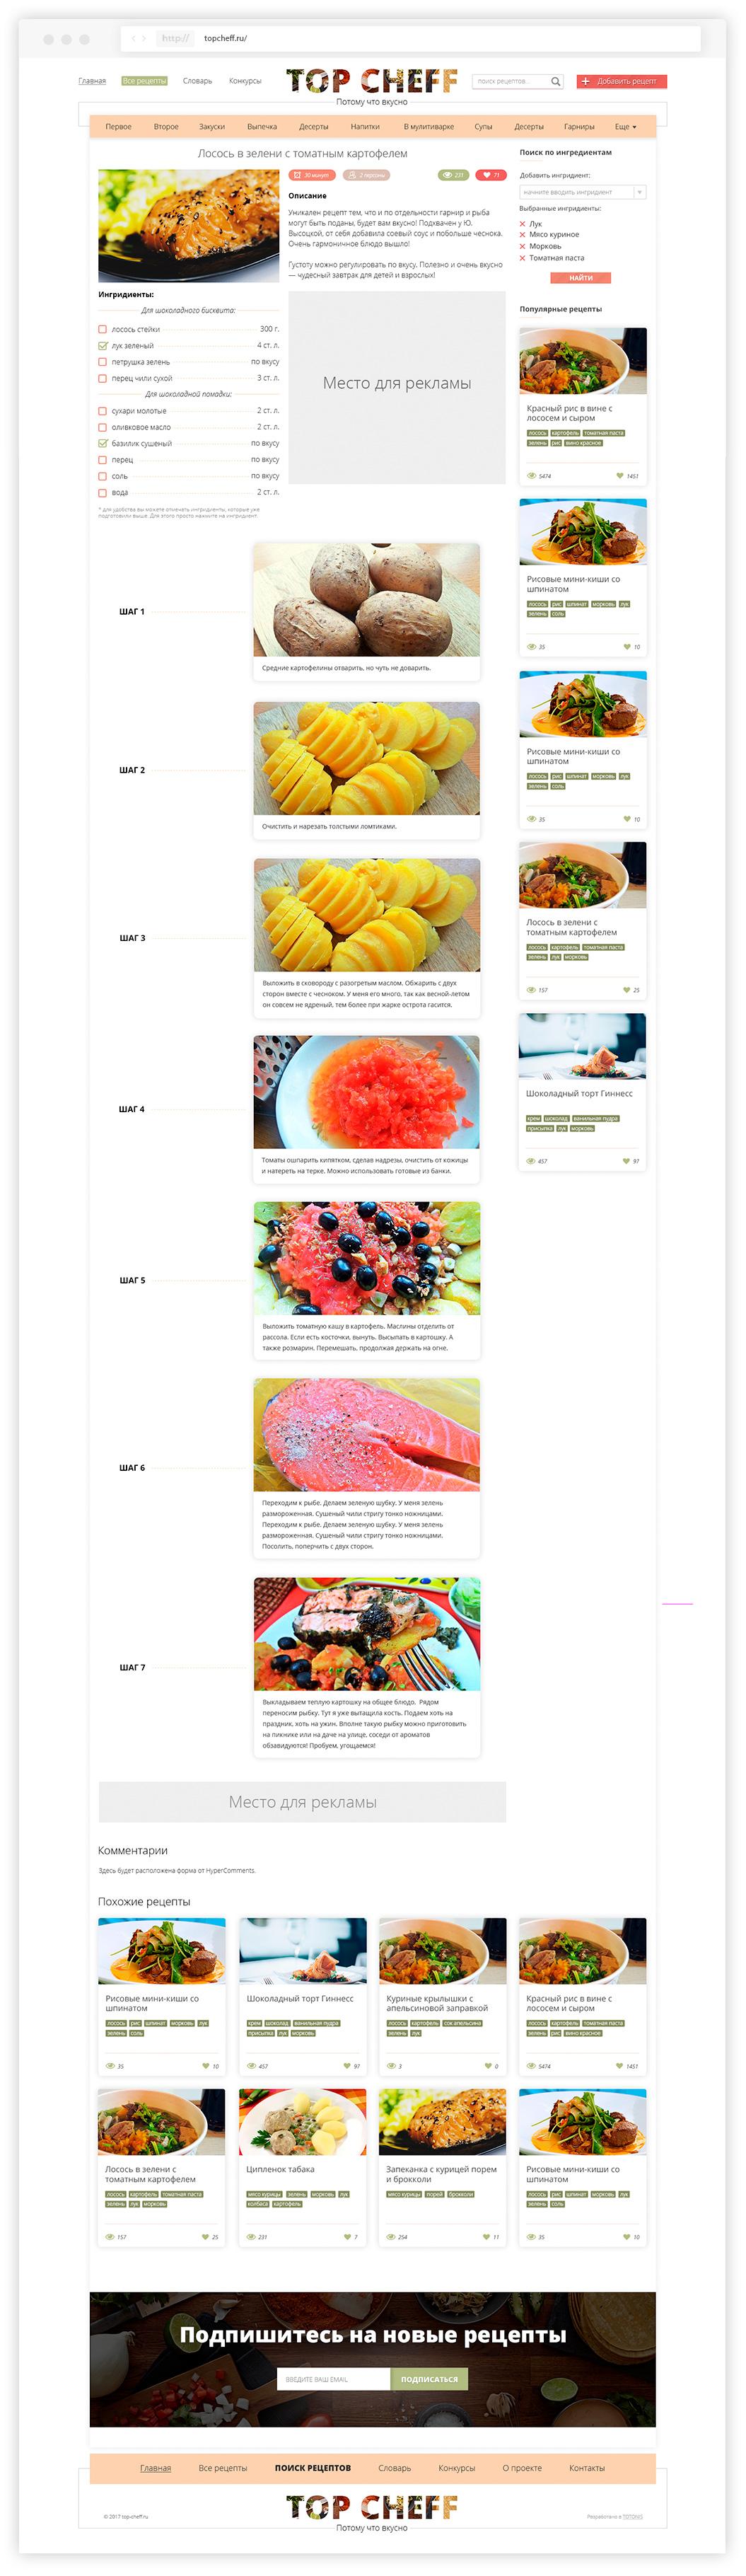 Страница рецепта сайта Topcheff